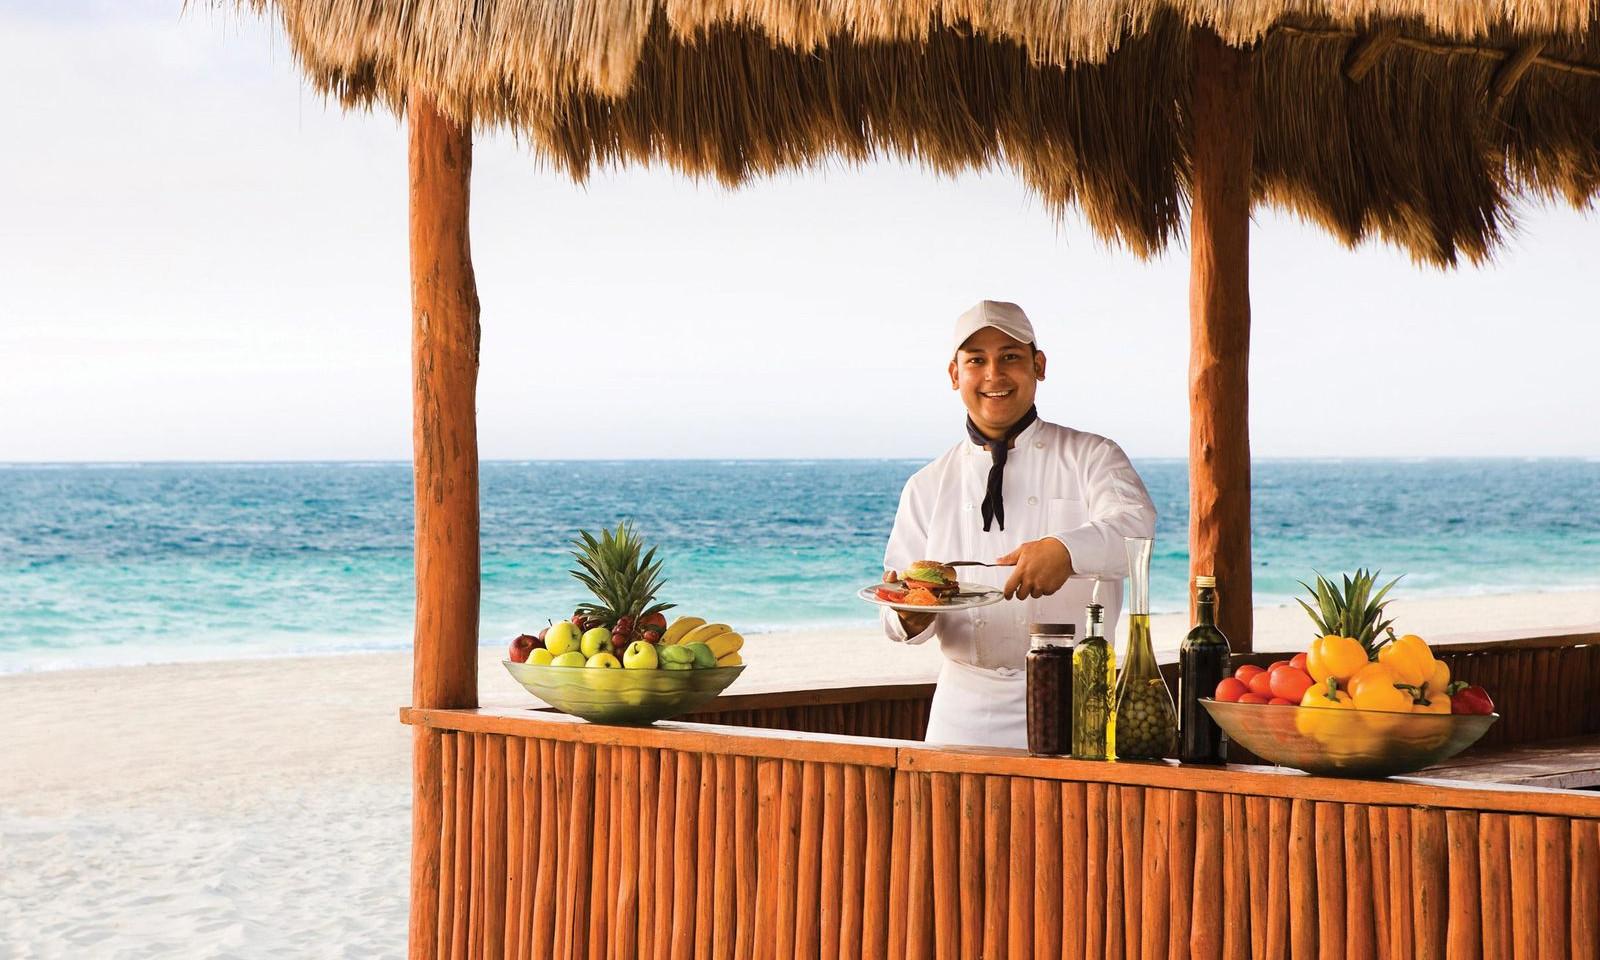 cancun-bars-beachfront.jpg